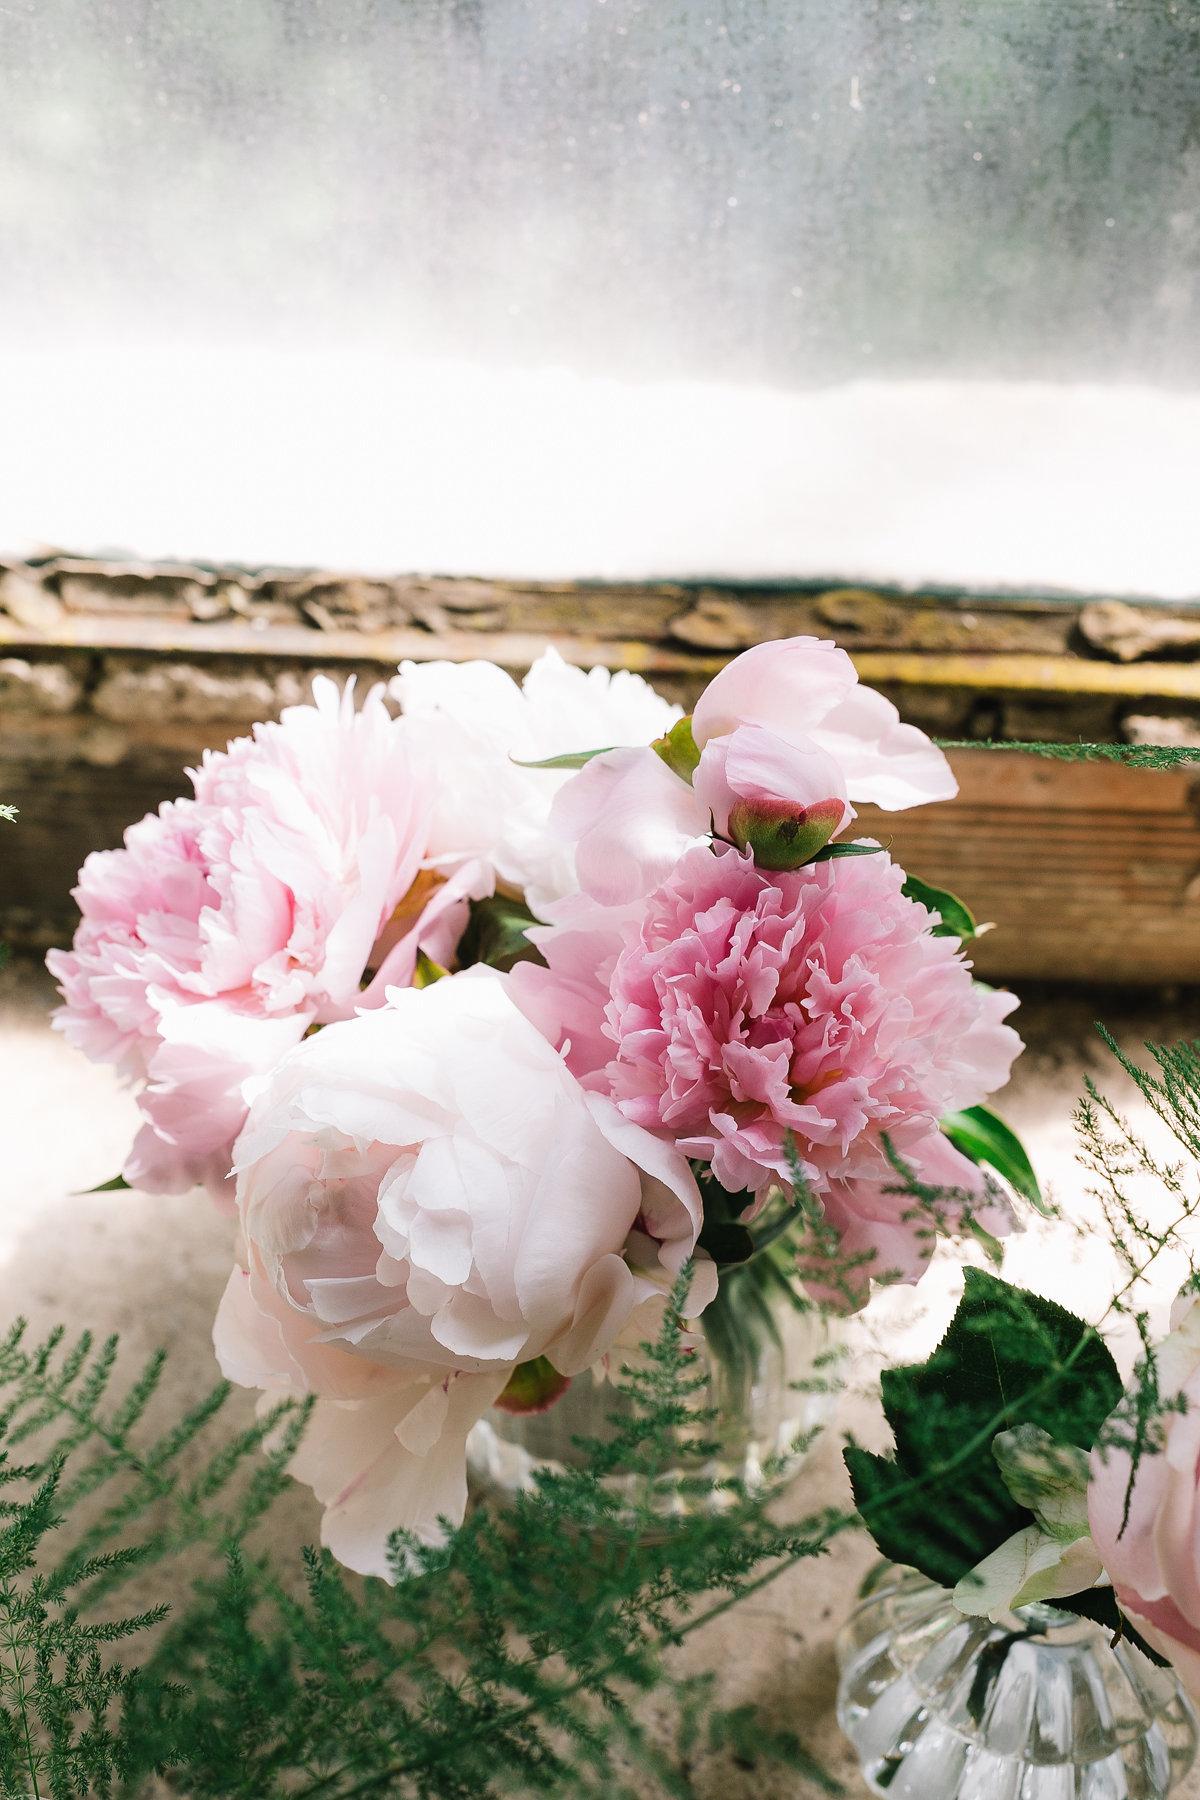 allestimento matrimonio con peonie rosa